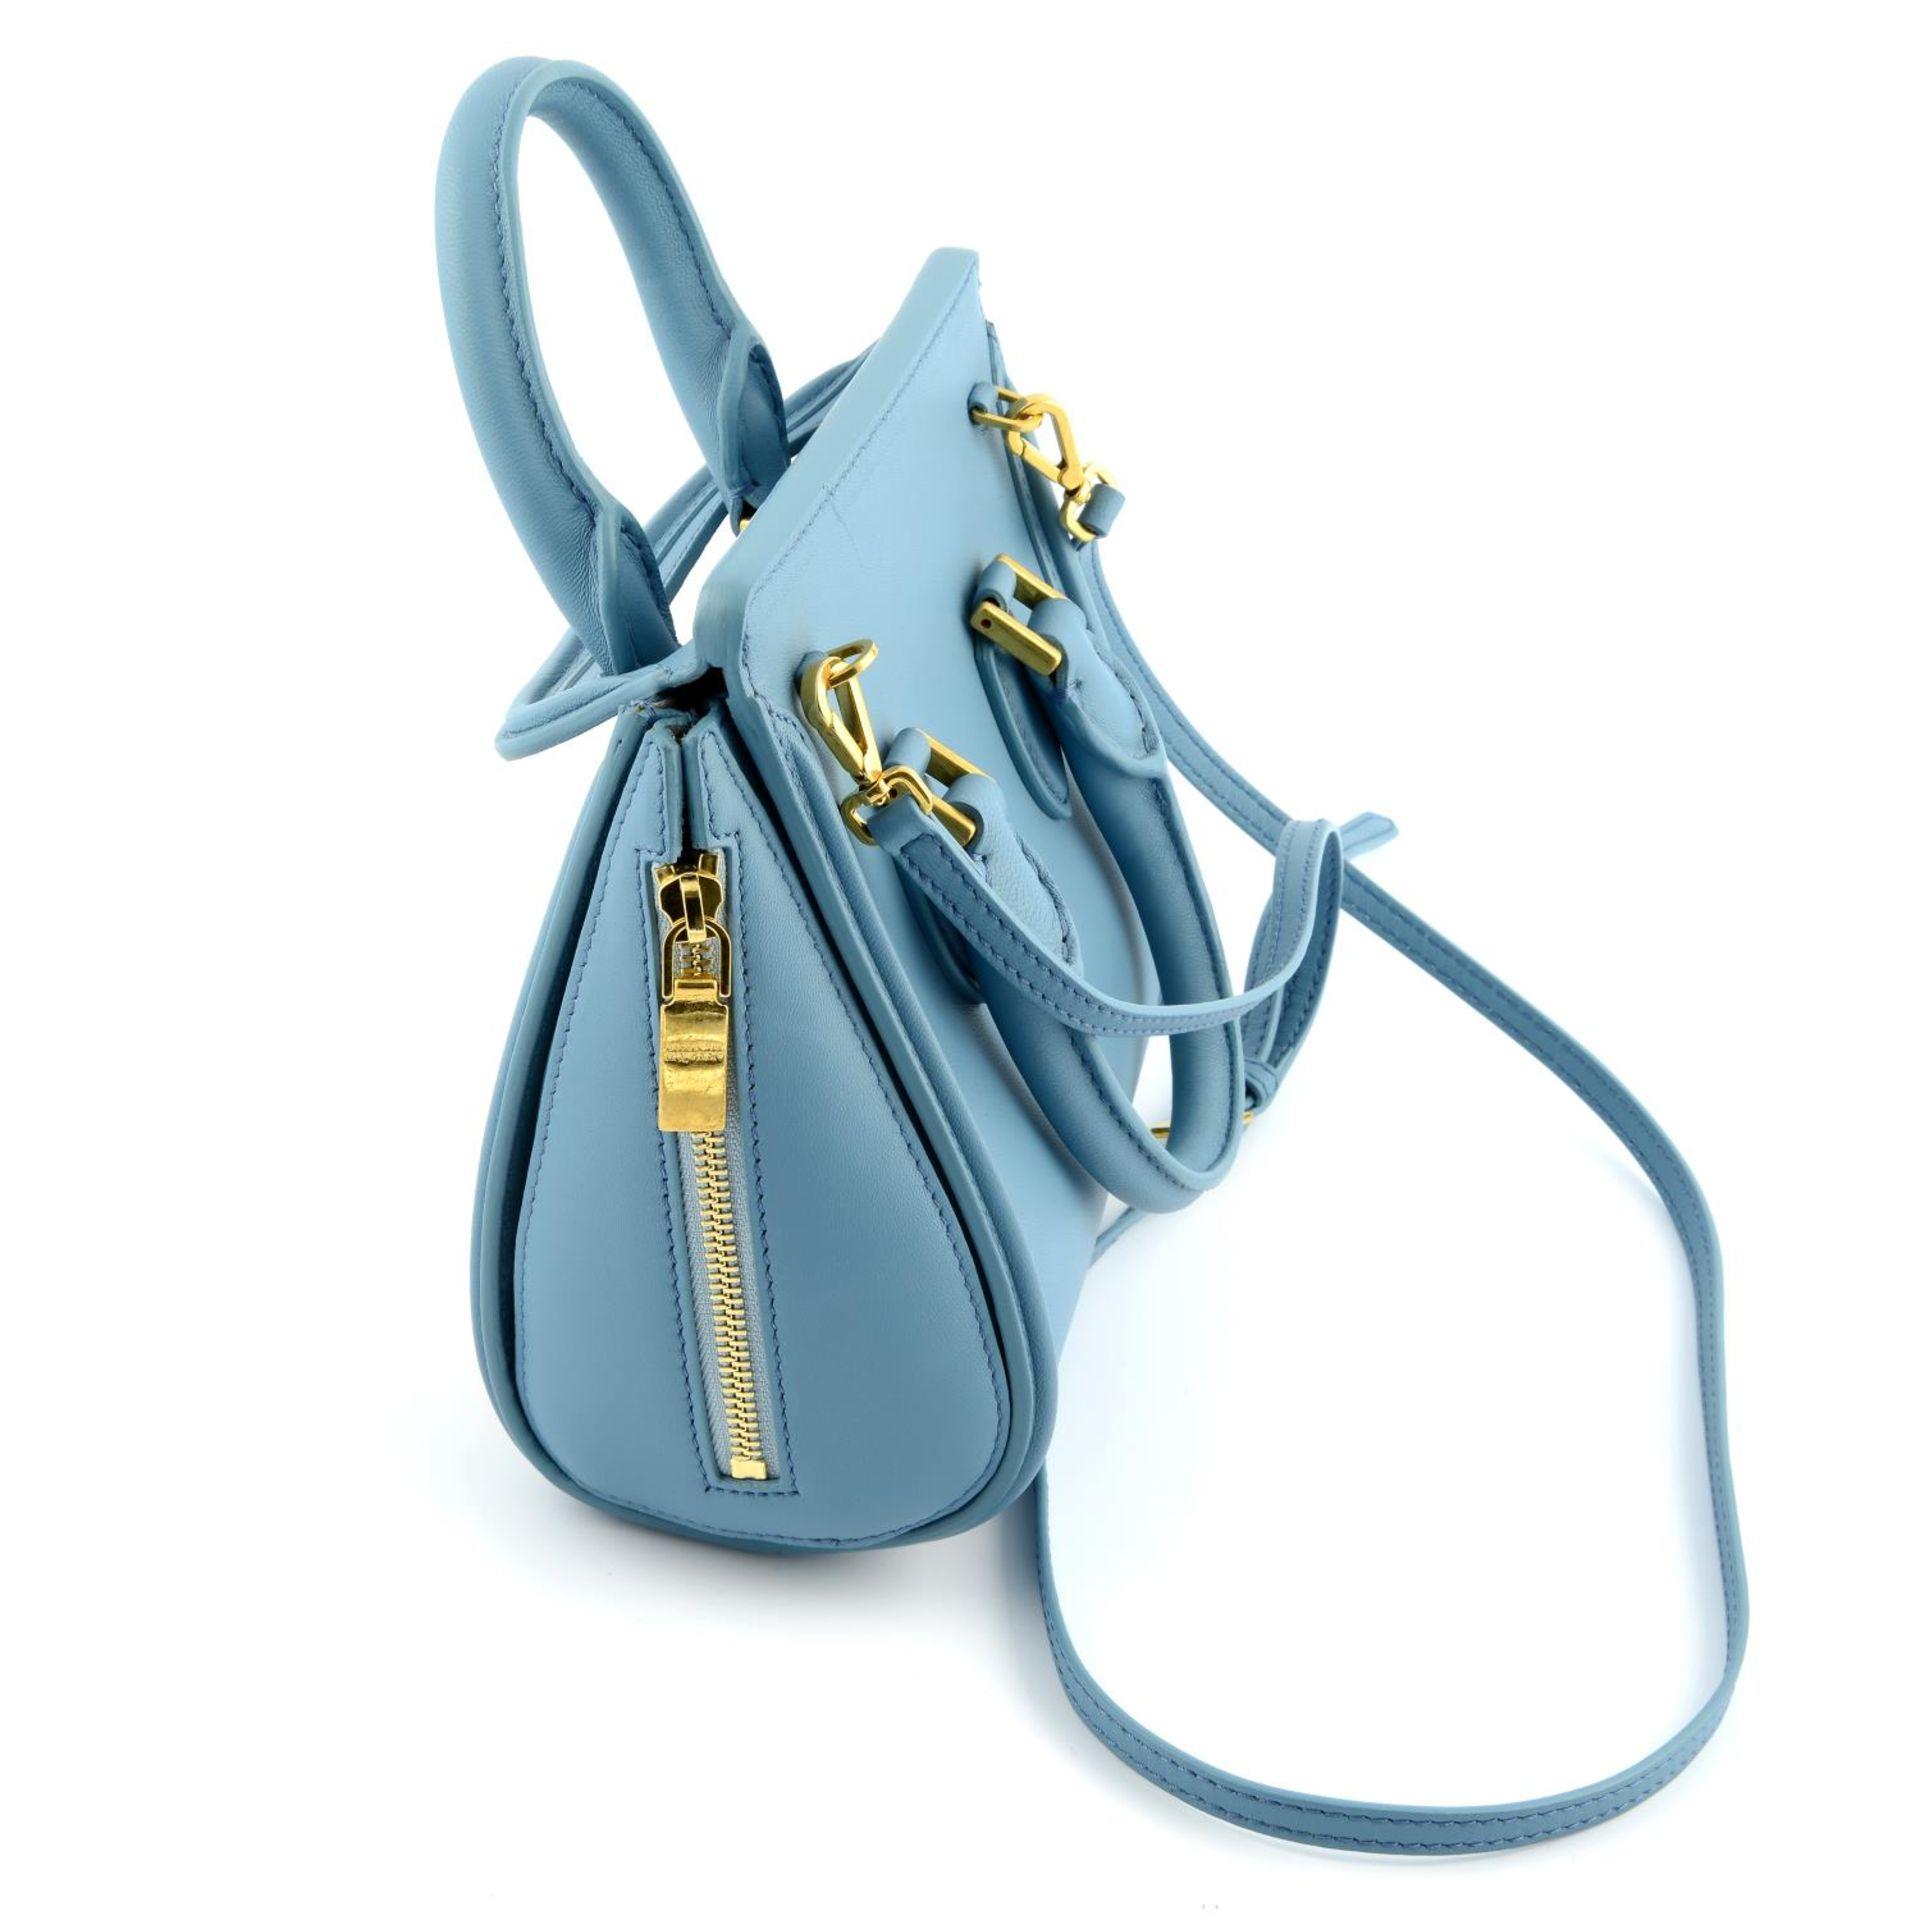 ALEXANDER MCQUEEN - a blue embellished mini Heroine handbag. - Image 3 of 6